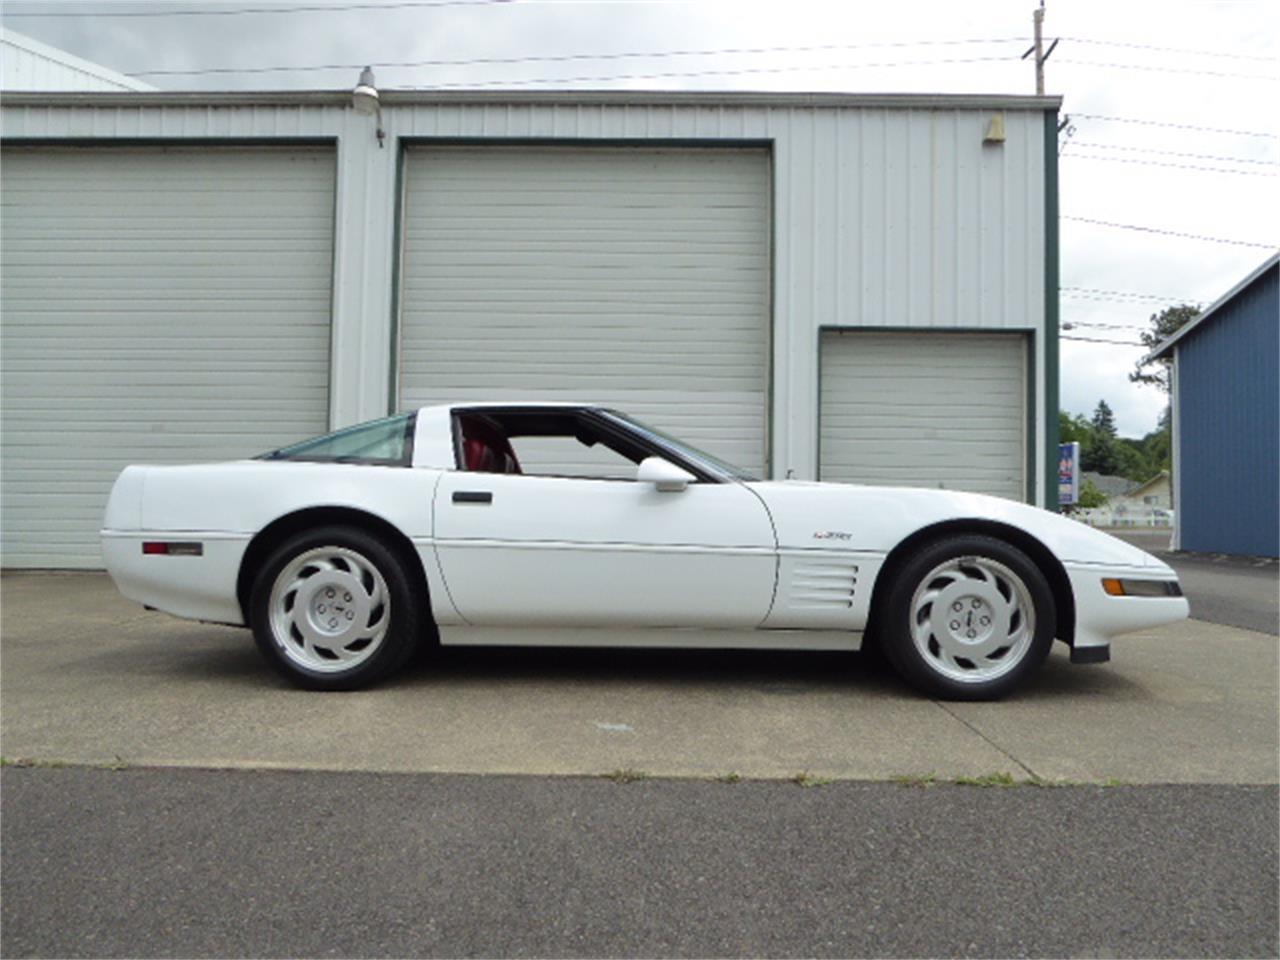 For Sale: 1992 Chevrolet Corvette ZR1 in Turner, Oregon